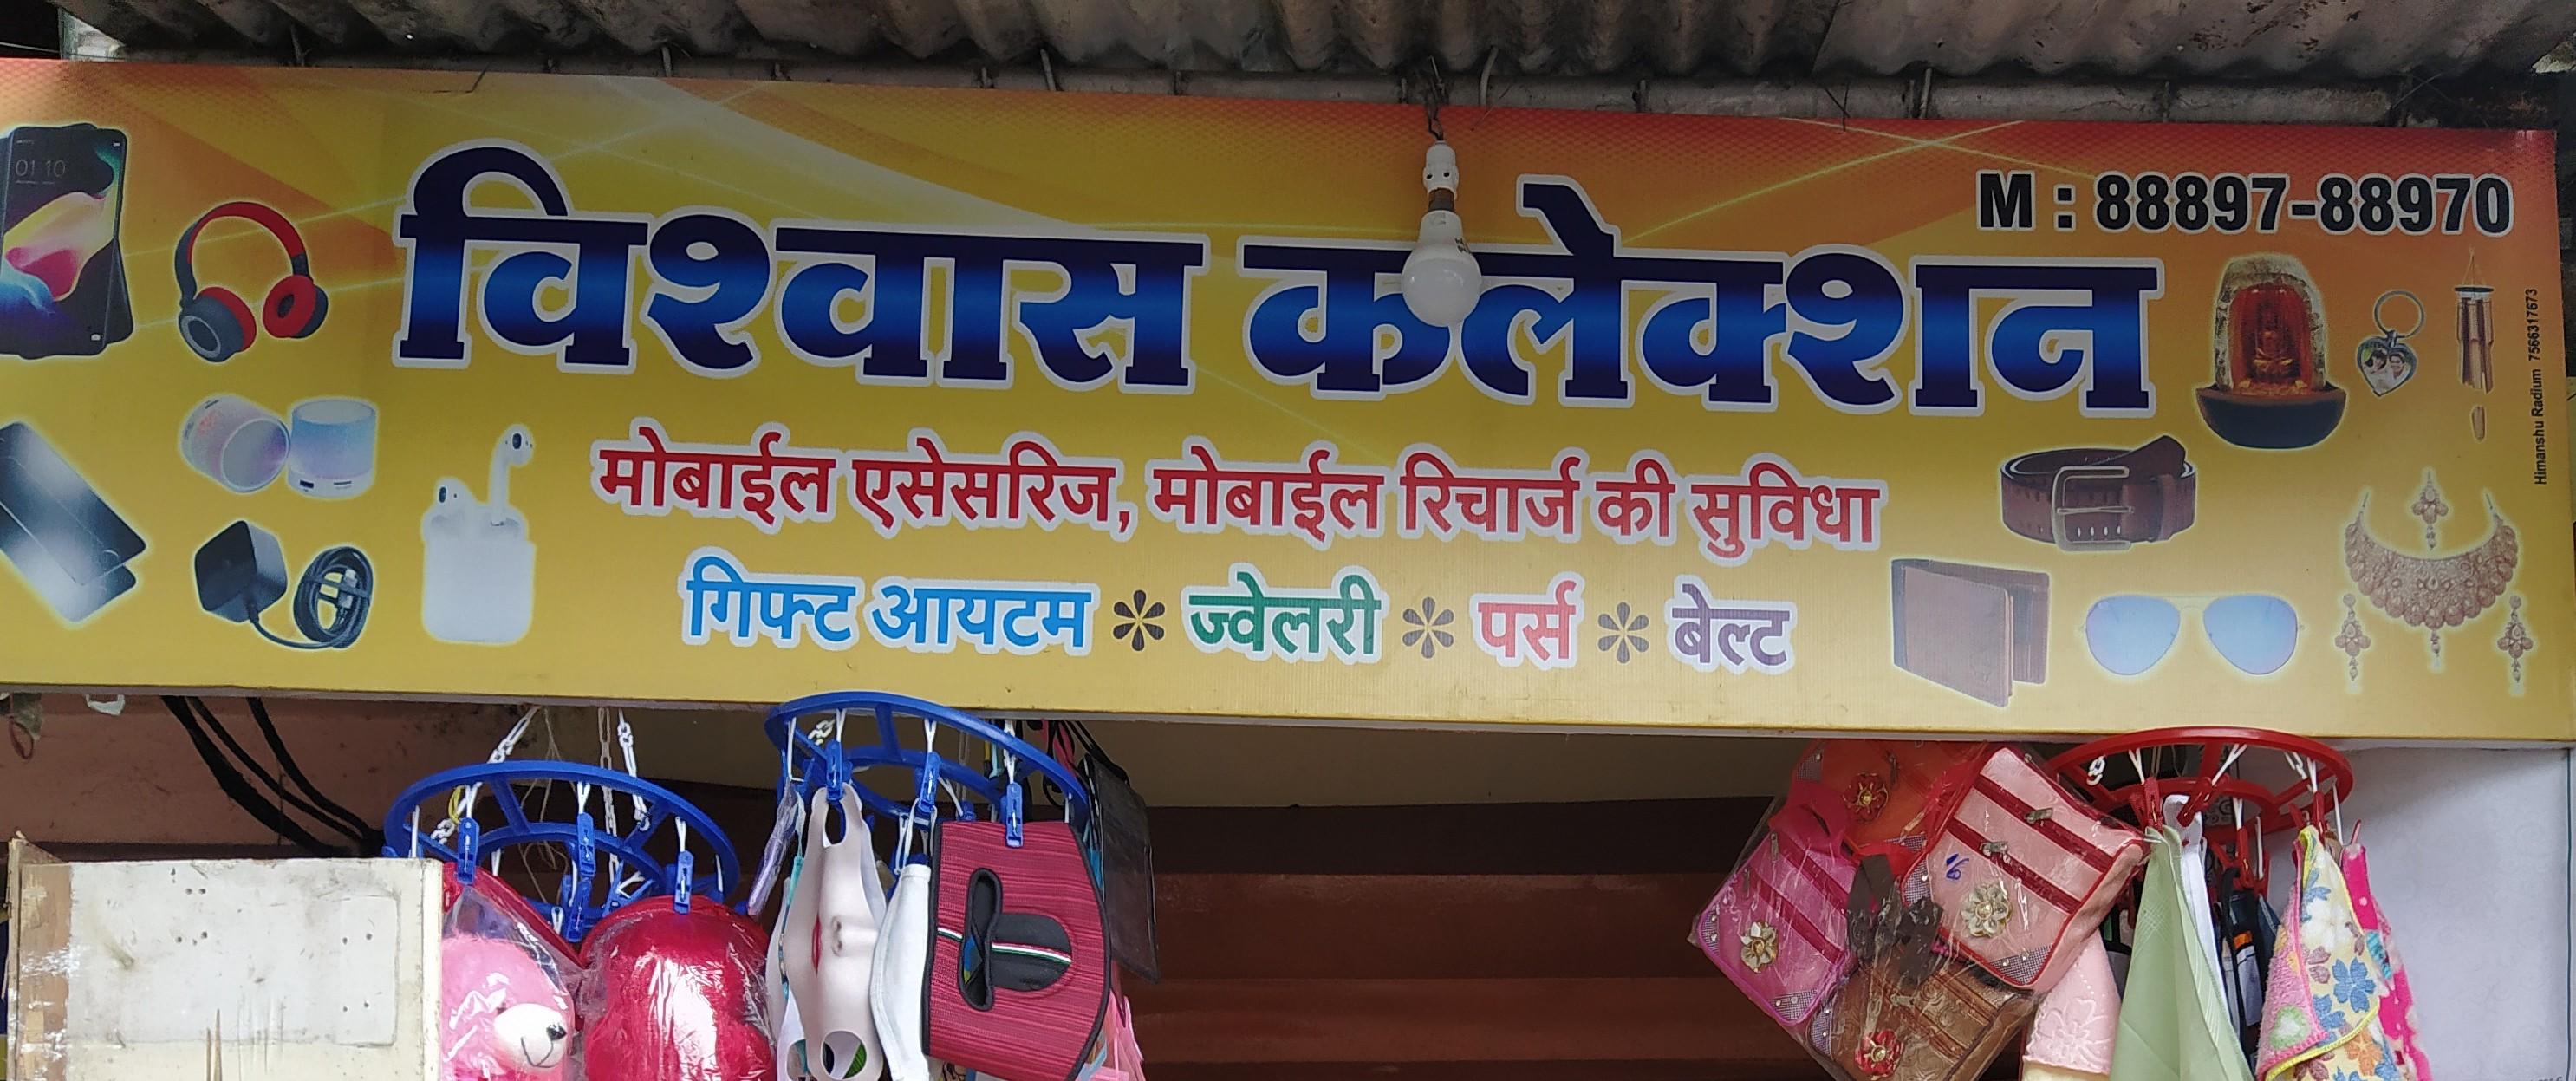 Vishwas collection